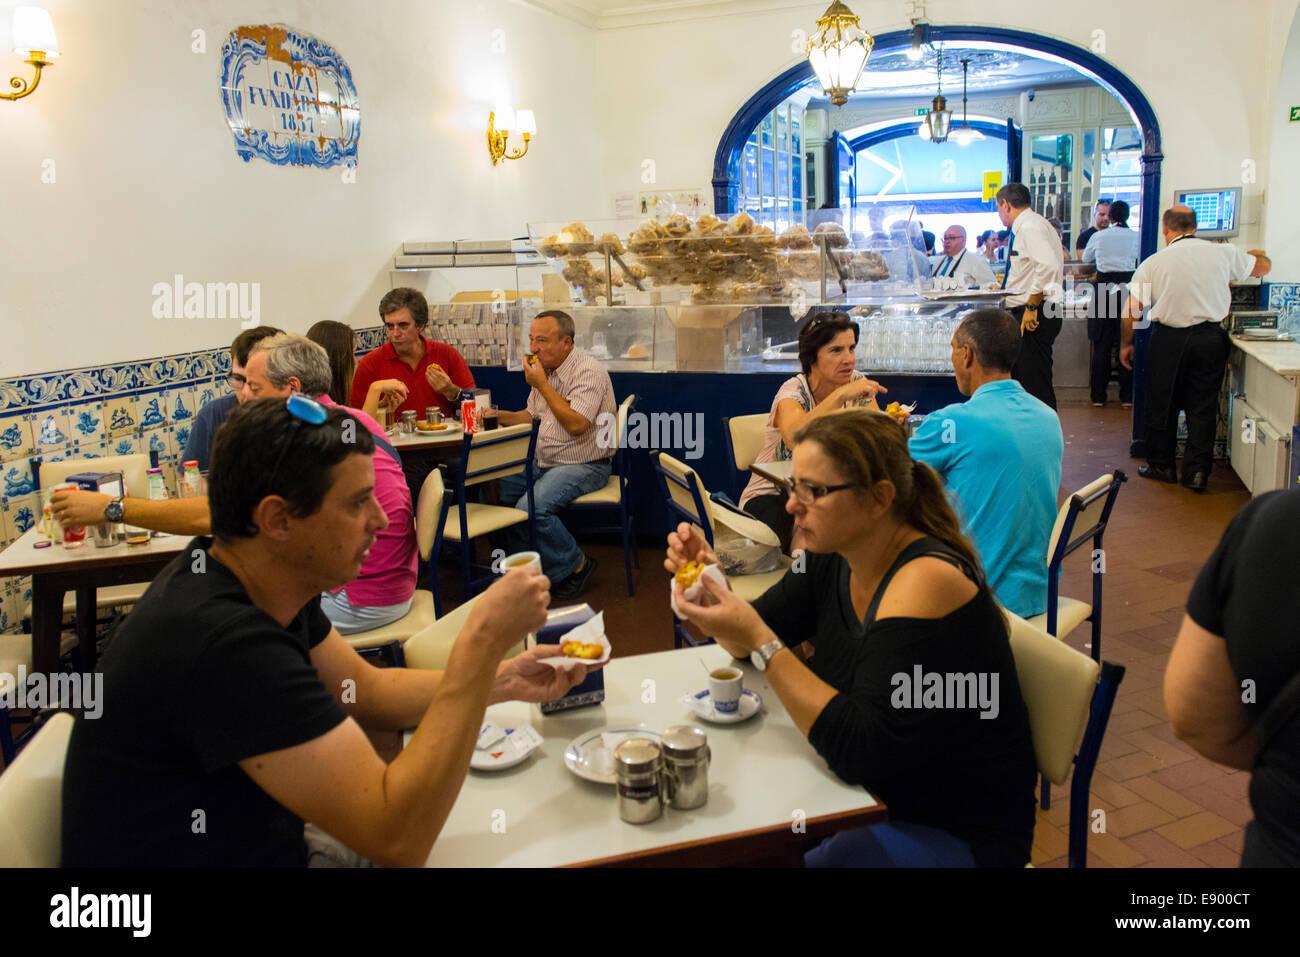 Portugal Lisbon Pasteis de Belem since 1837 pastel de nata custard tart tarts bakery crowd queue counter pastelarias Stock Photo